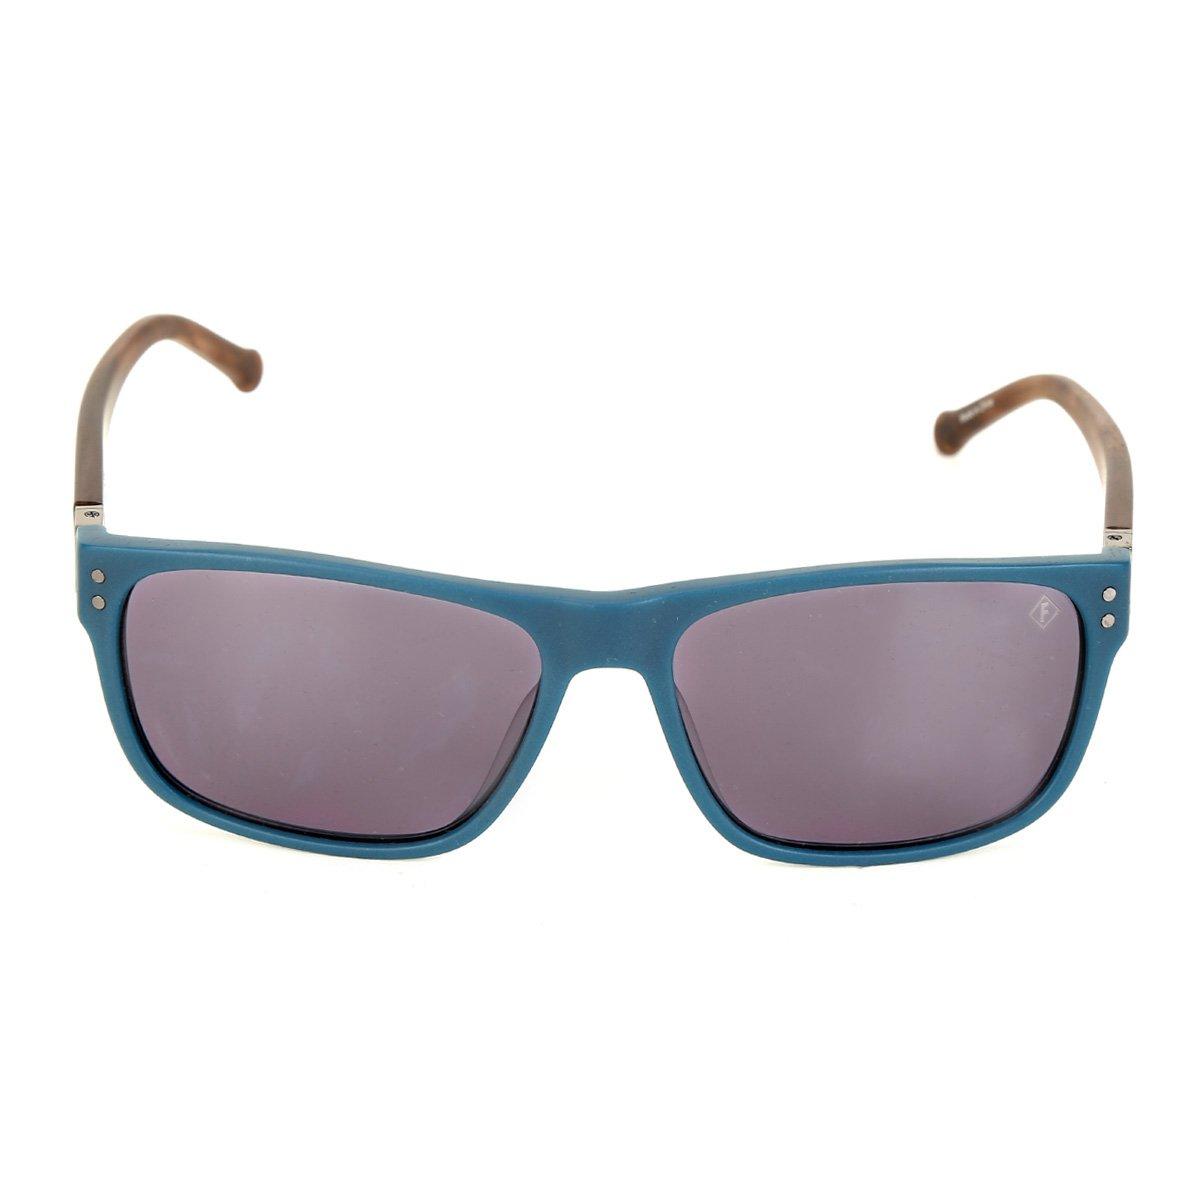 Óculos de Sol Forum Marmorizado Masculino - Compre Agora   Netshoes e3b31cd262